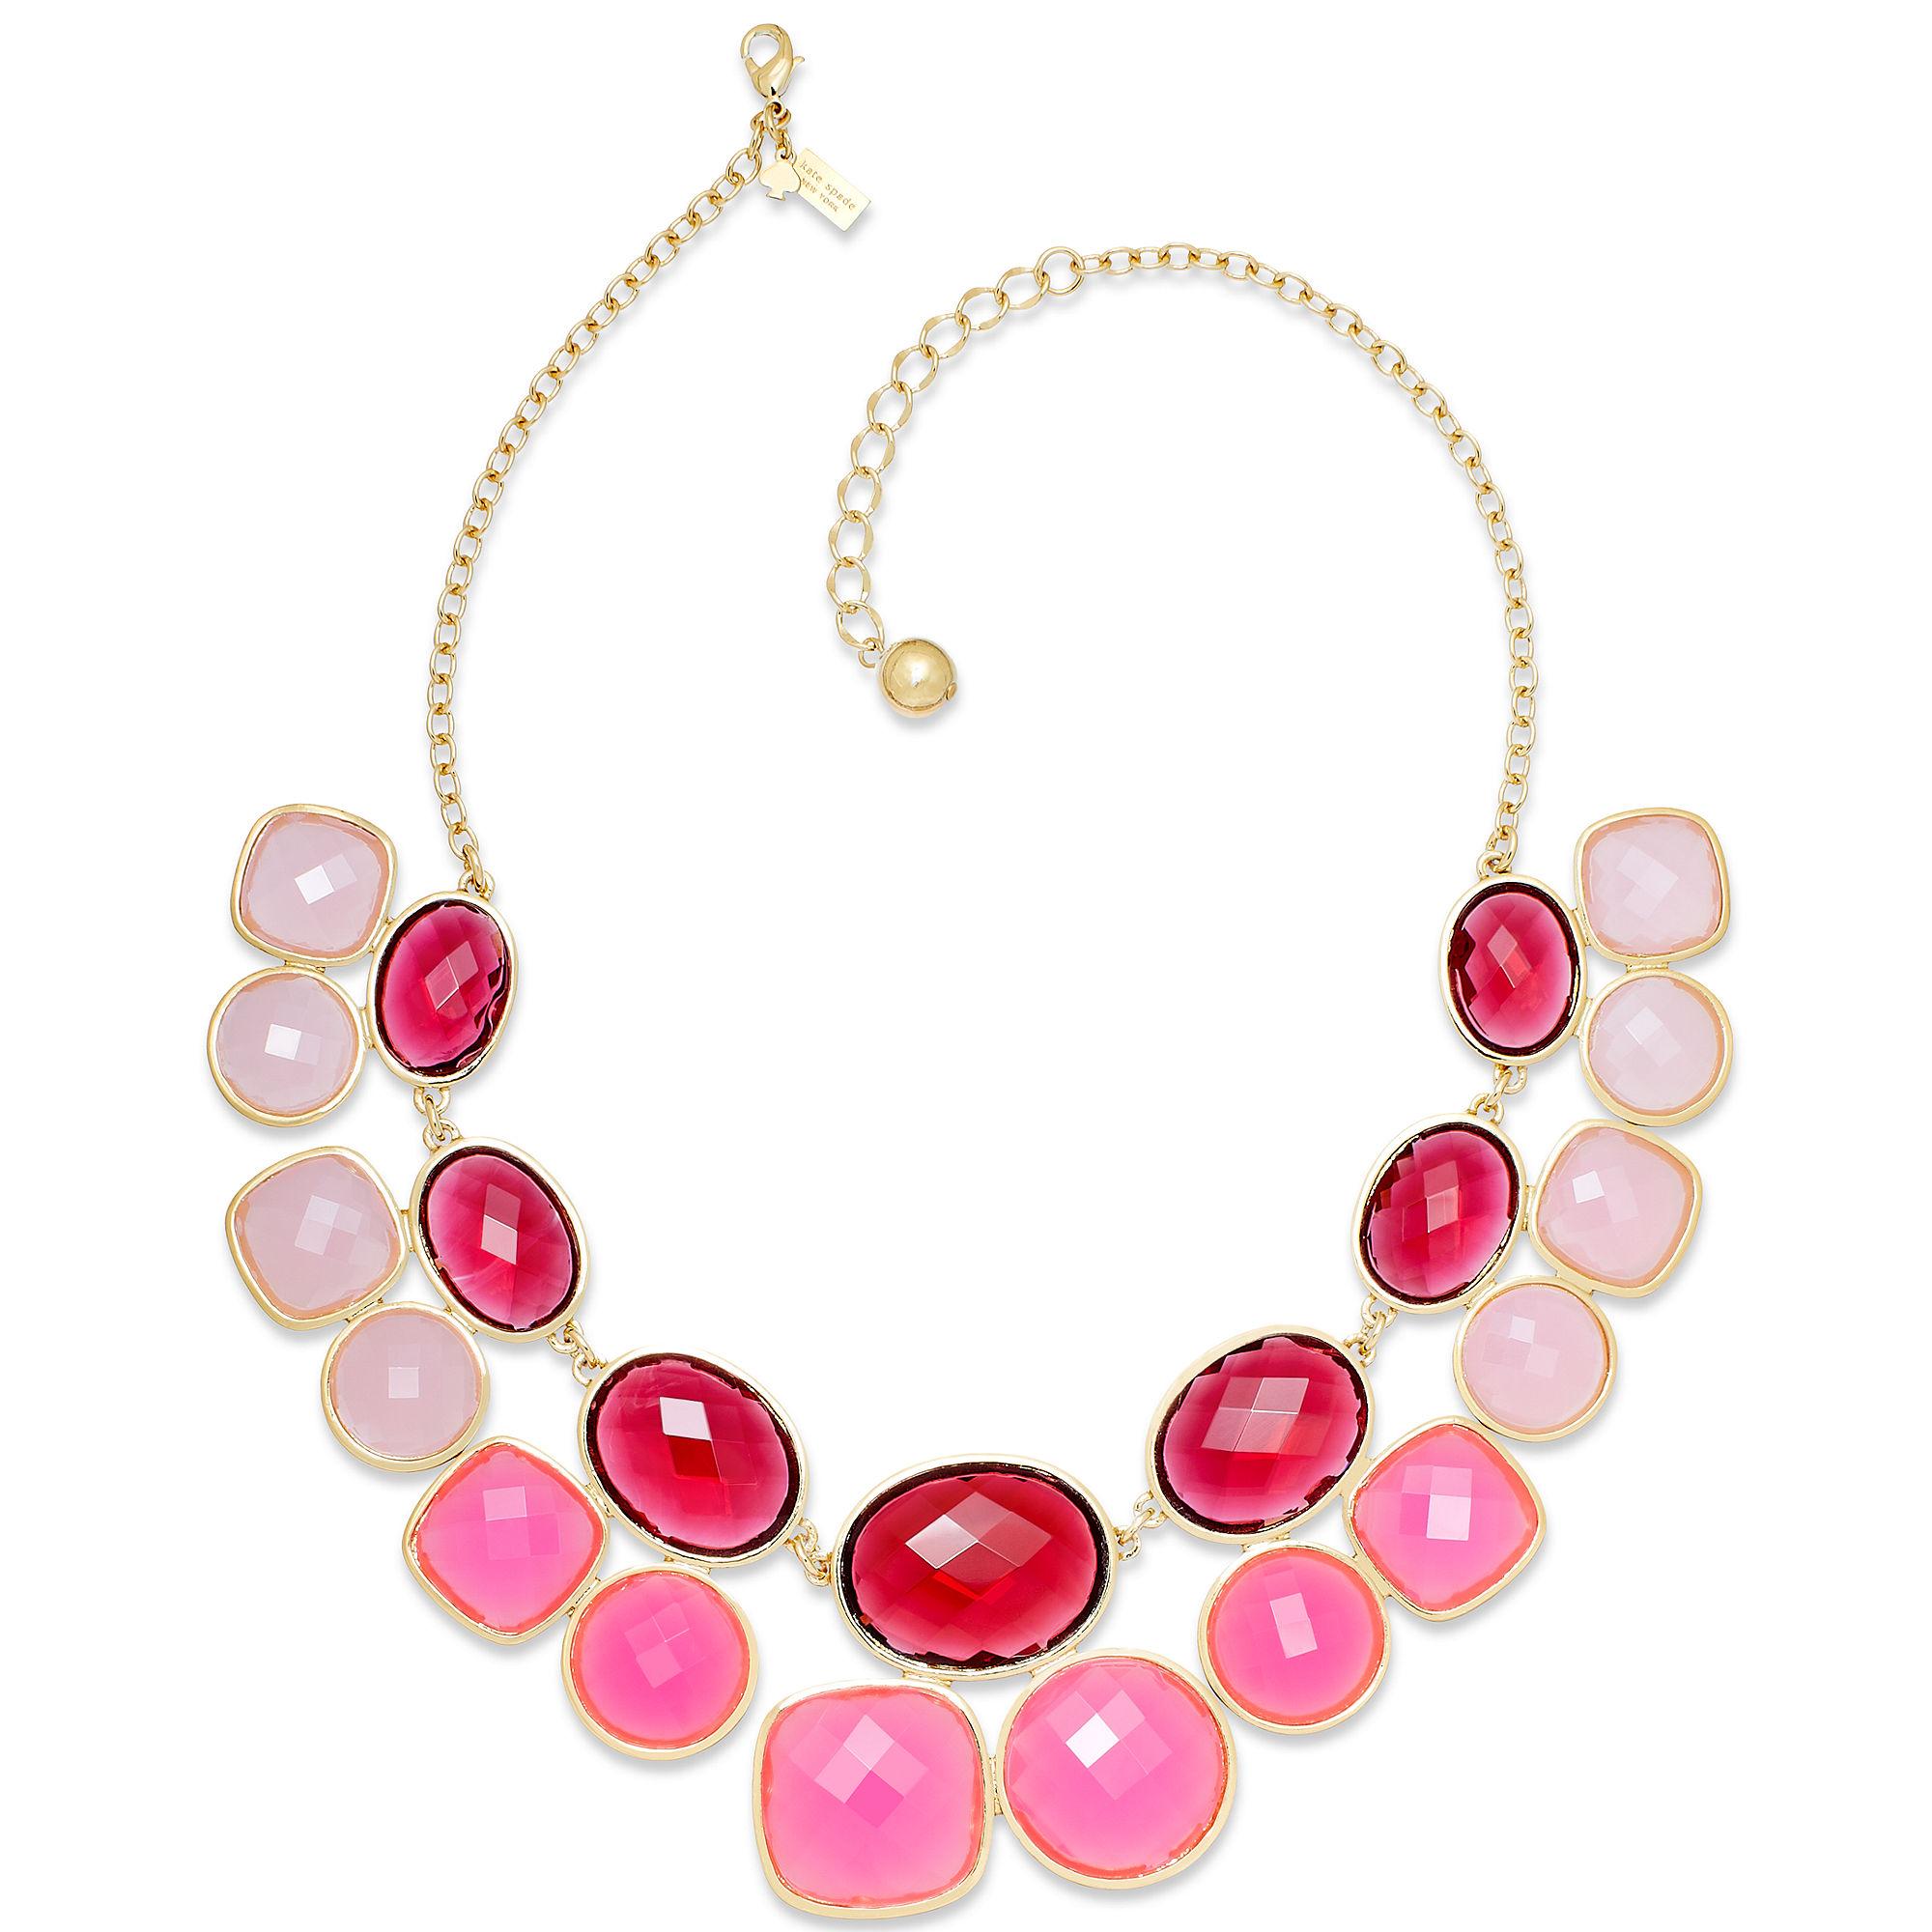 Kate Spade Kate Spade New York Necklace Goldtone Pink ...